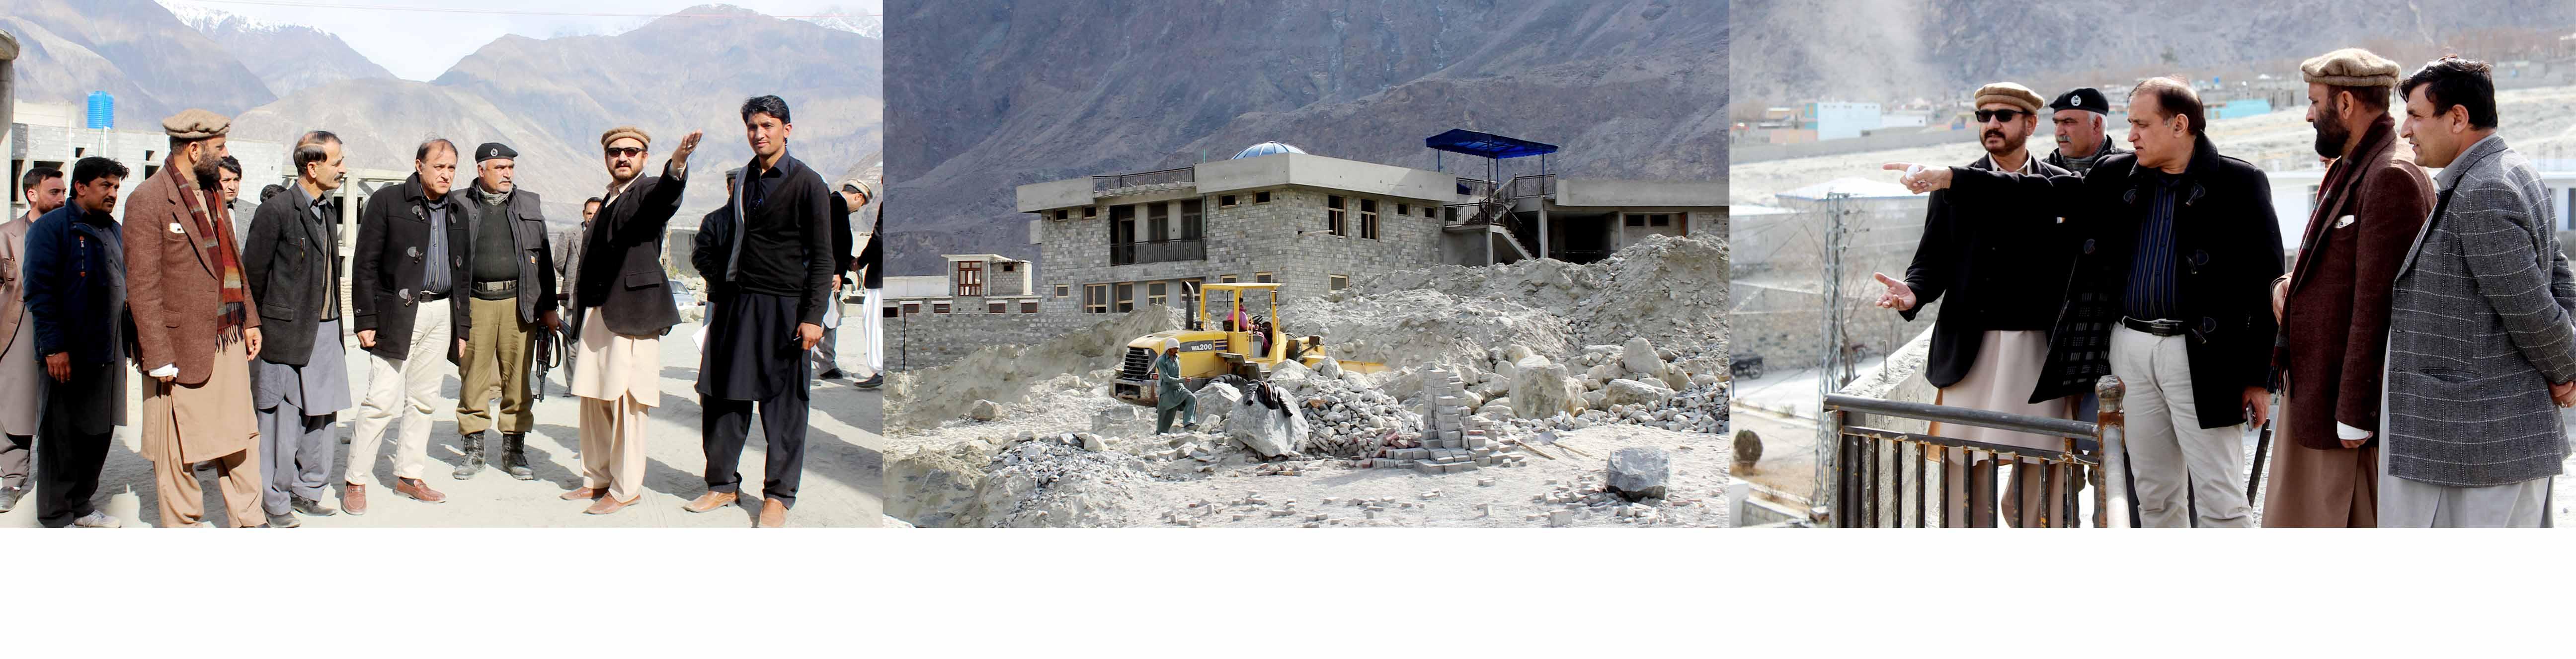 وزیر تعمیرات نےمتعلقہ حکام کو اسمبلی بلڈنگ کو جلد از جلد تعمیرکی ہدایات جاری کئے